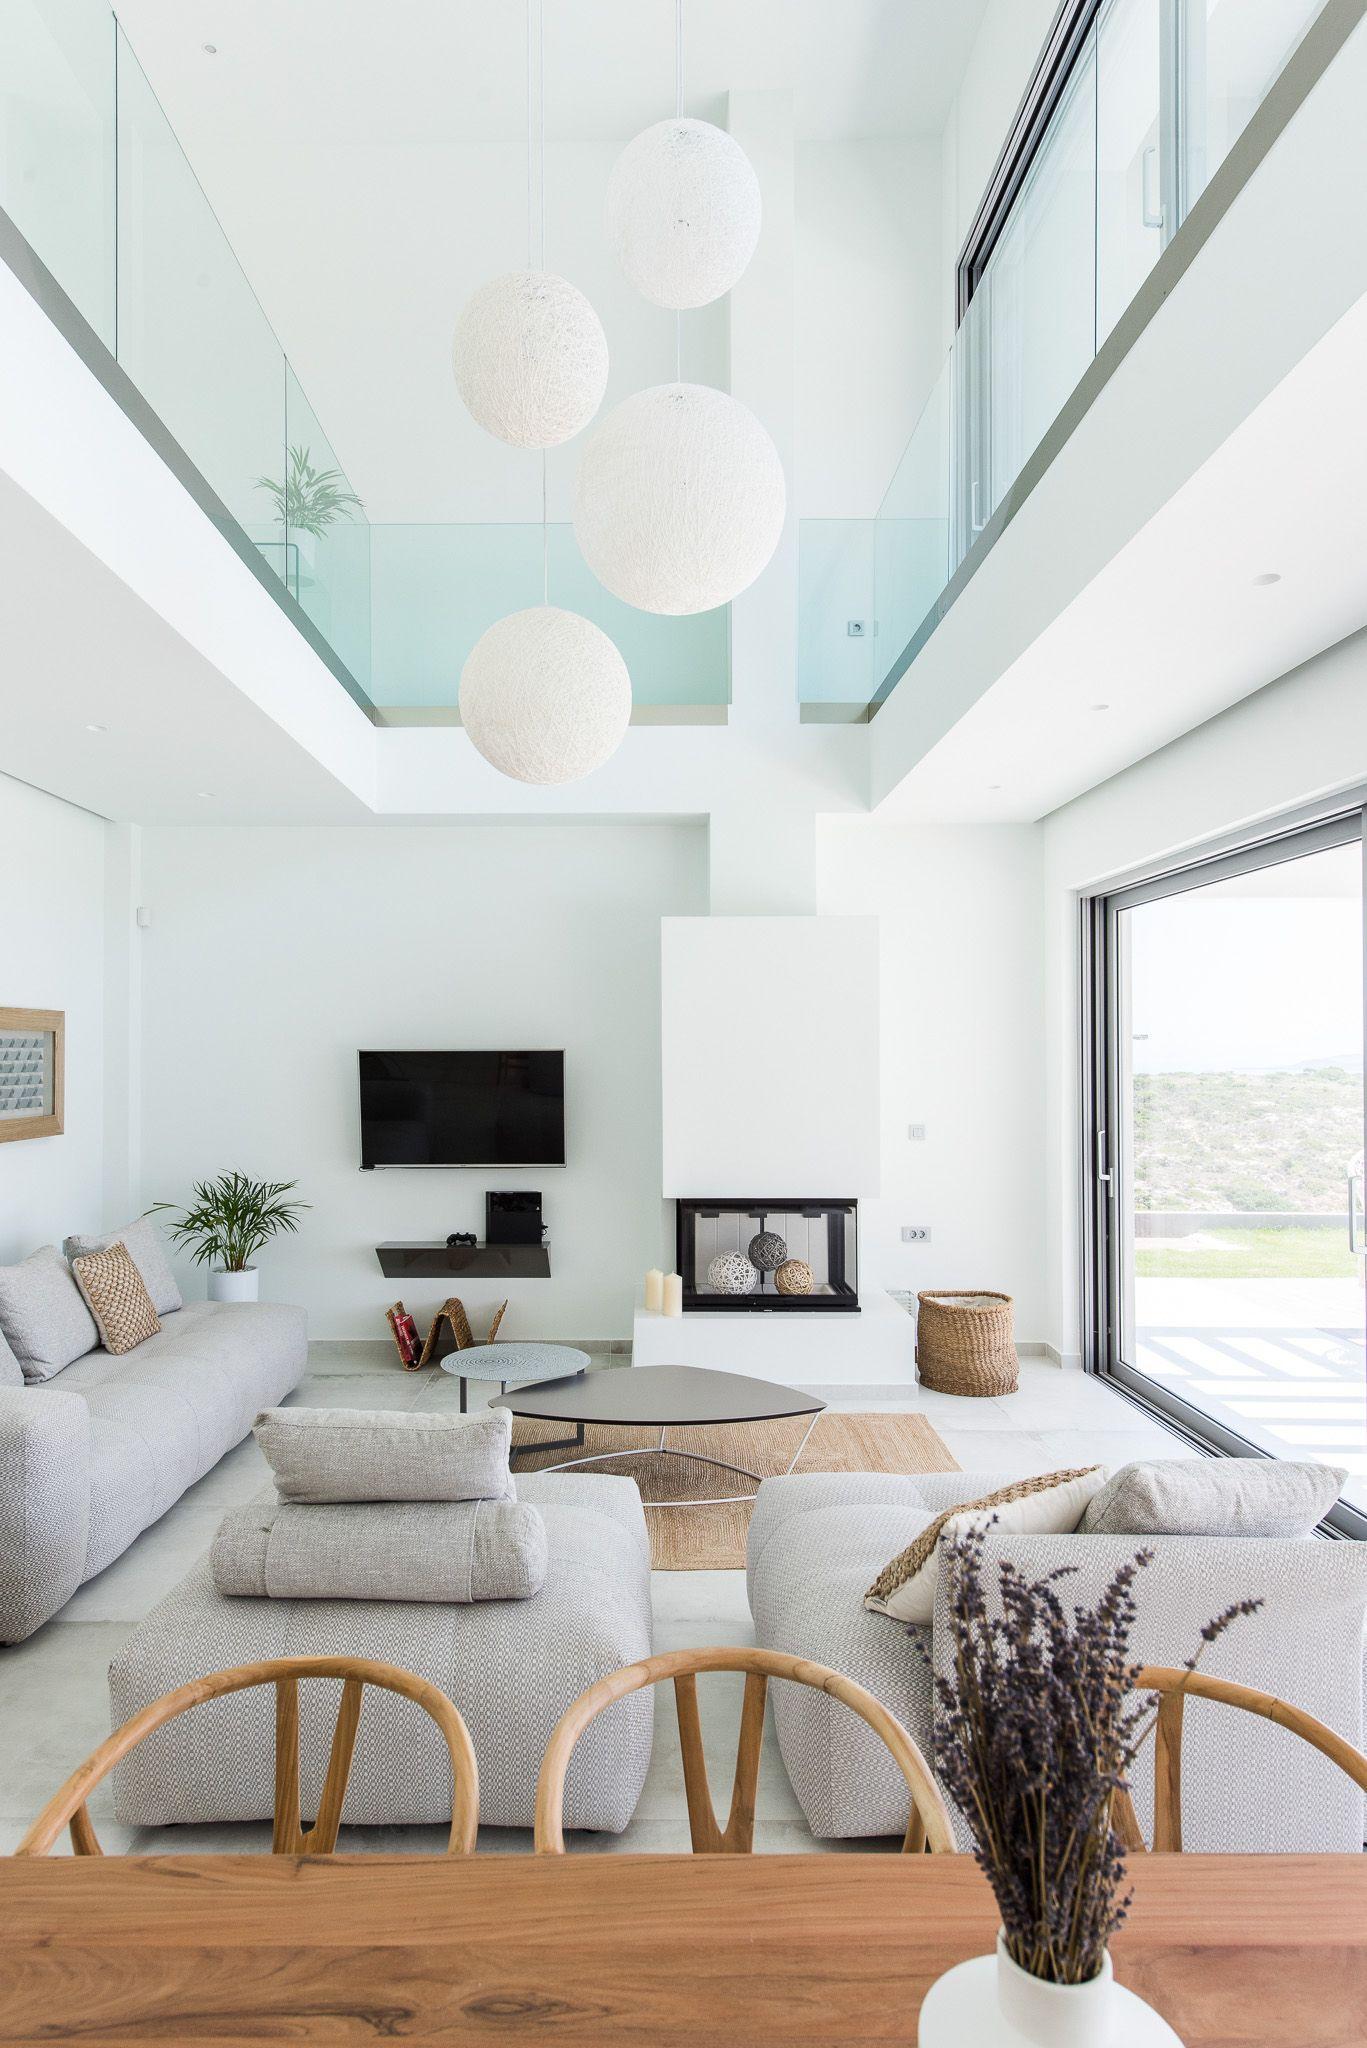 Villa Alas Greece, interior design by J&A photo by ...